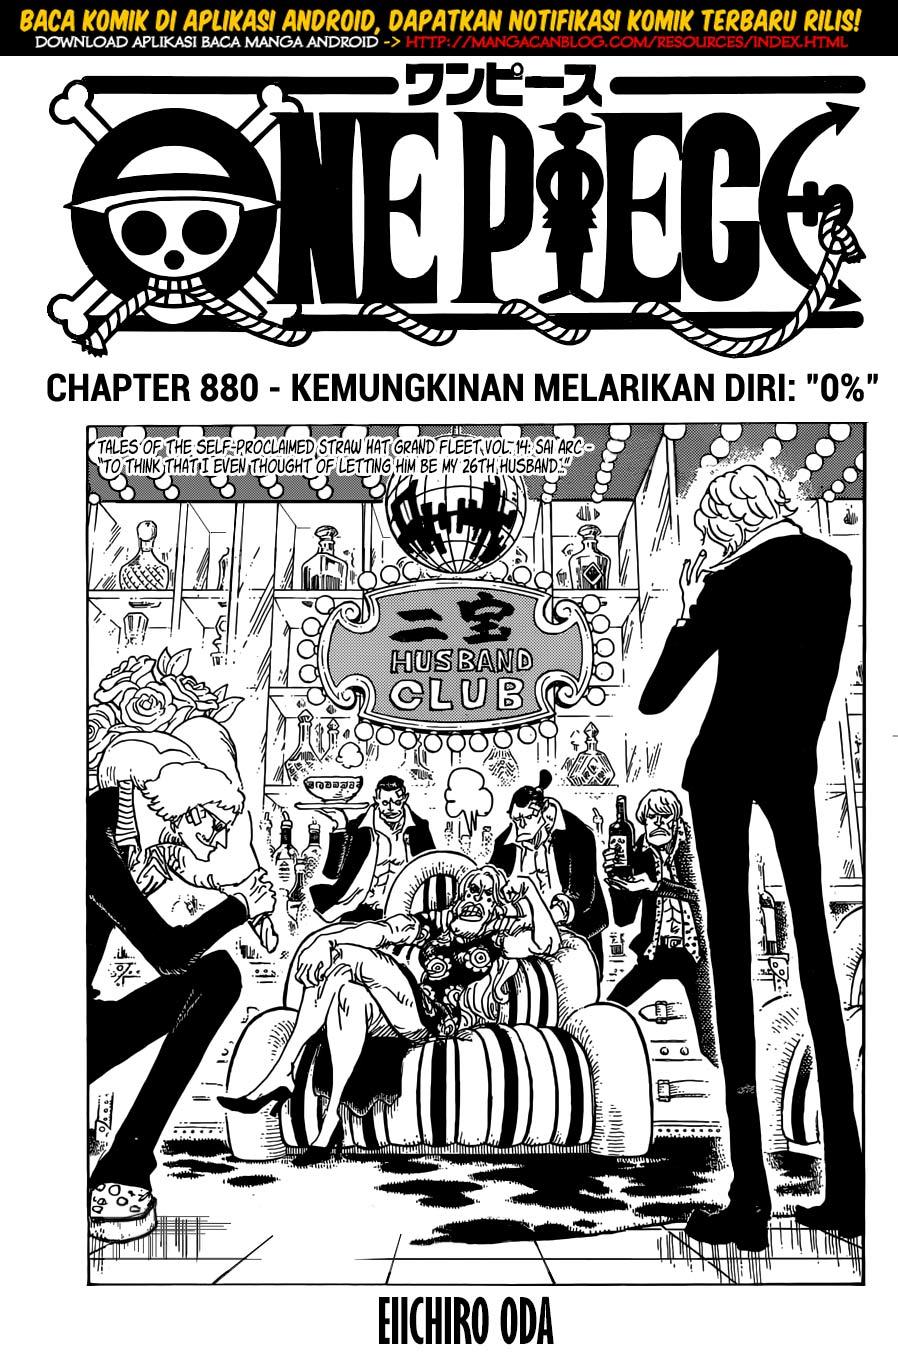 Dilarang COPAS - situs resmi www.mangacanblog.com - Komik one piece 880 - kemungkinan melarikan diri 0 persen 881 Indonesia one piece 880 - kemungkinan melarikan diri 0 persen Terbaru |Baca Manga Komik Indonesia|Mangacan